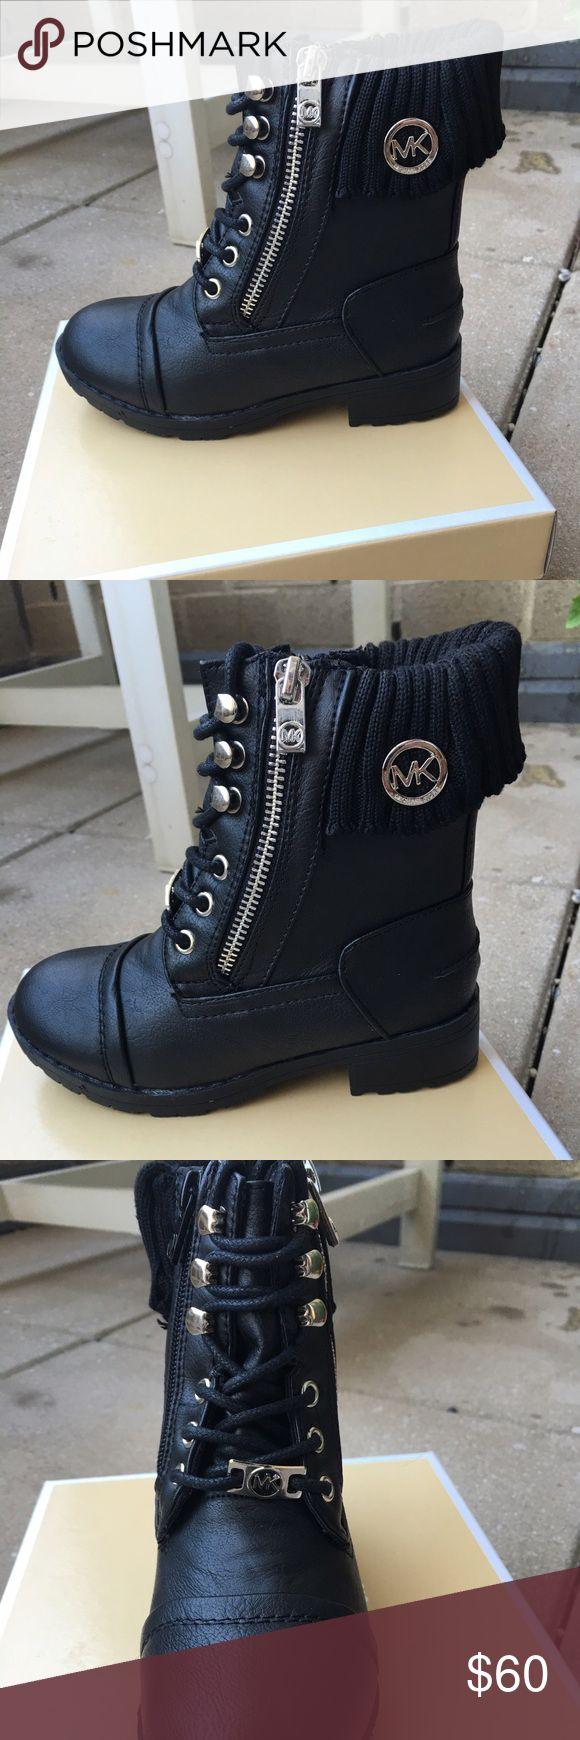 black michael kors purse clearance michael kors rain boots nordstrom